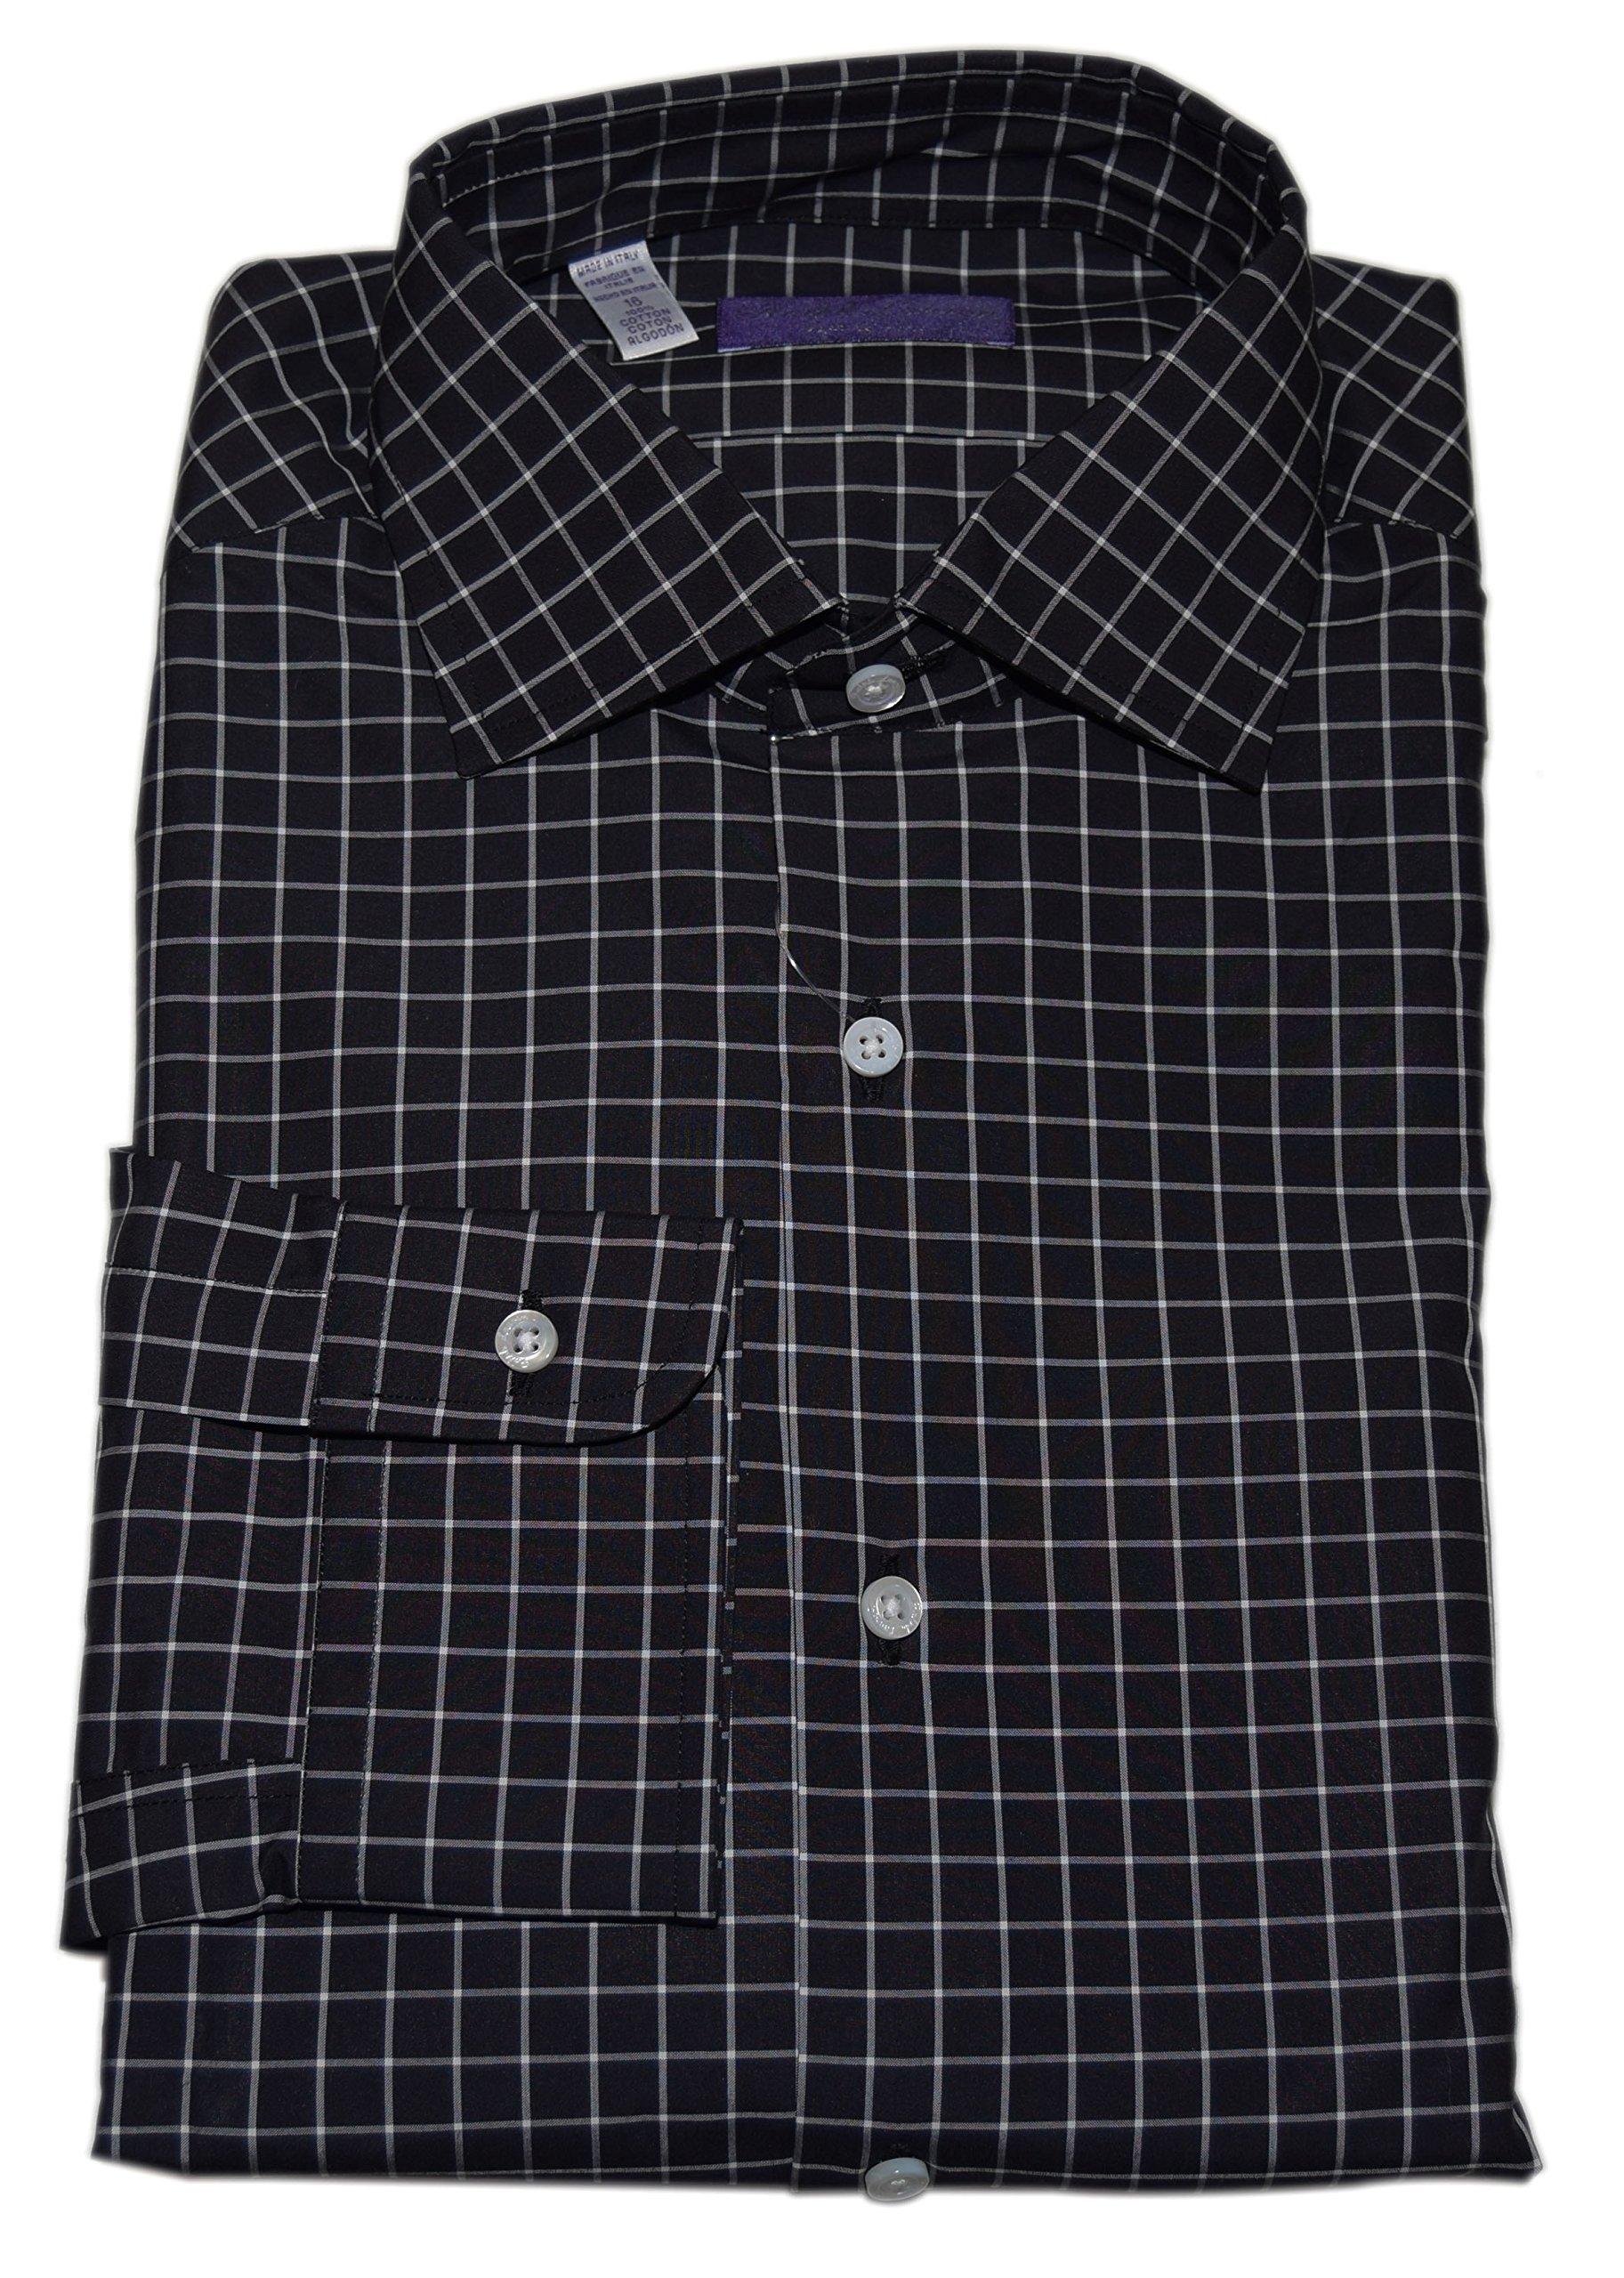 Ralph Lauren Polo Purple Label Men Fine Dress Shirt Italy Check Black White 14.5